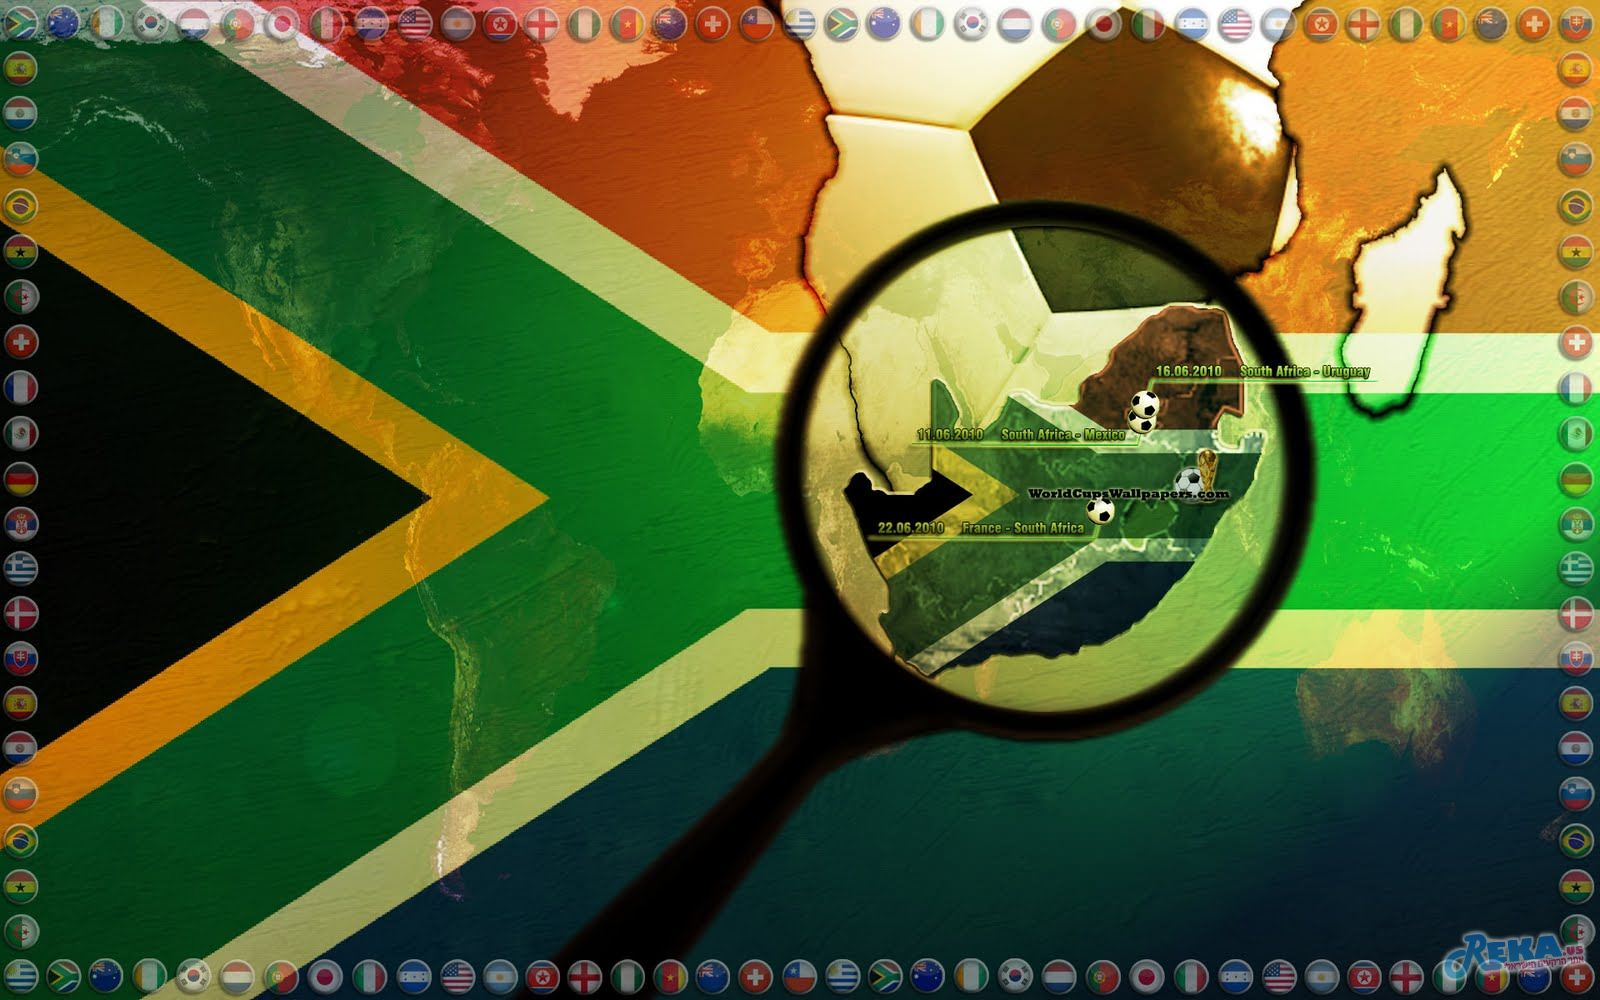 South-Africa-World-Cup-2010-Widescreen-Wallpaper